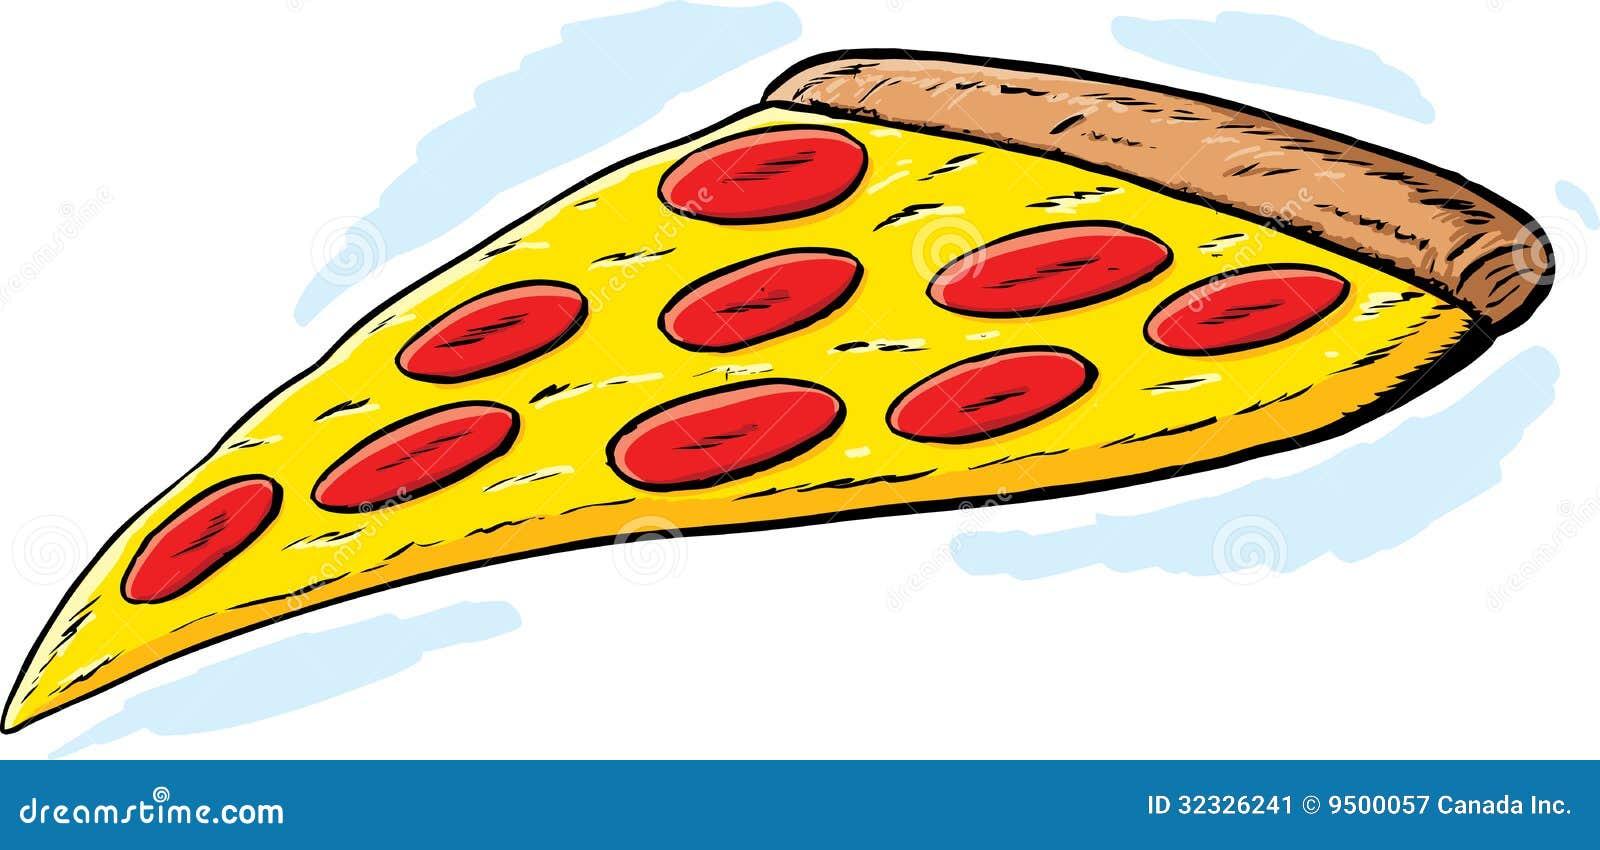 Pizza Slice Stock Image - Image: 32326241